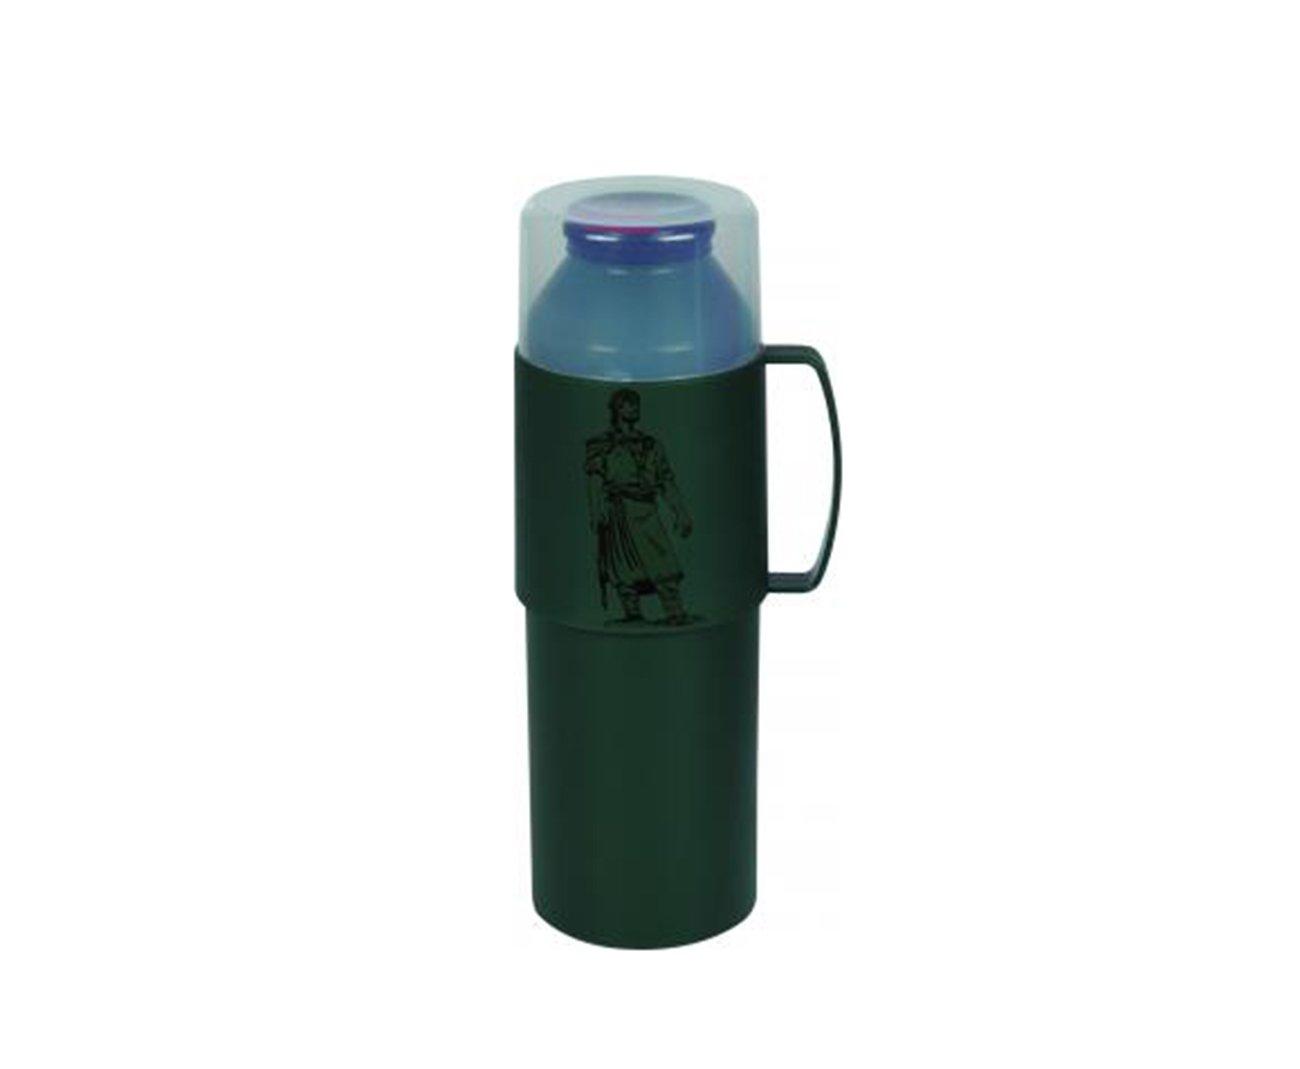 Garrafa Térmica Farroupilha 1,0 Litro Verde 25100602 - Mor